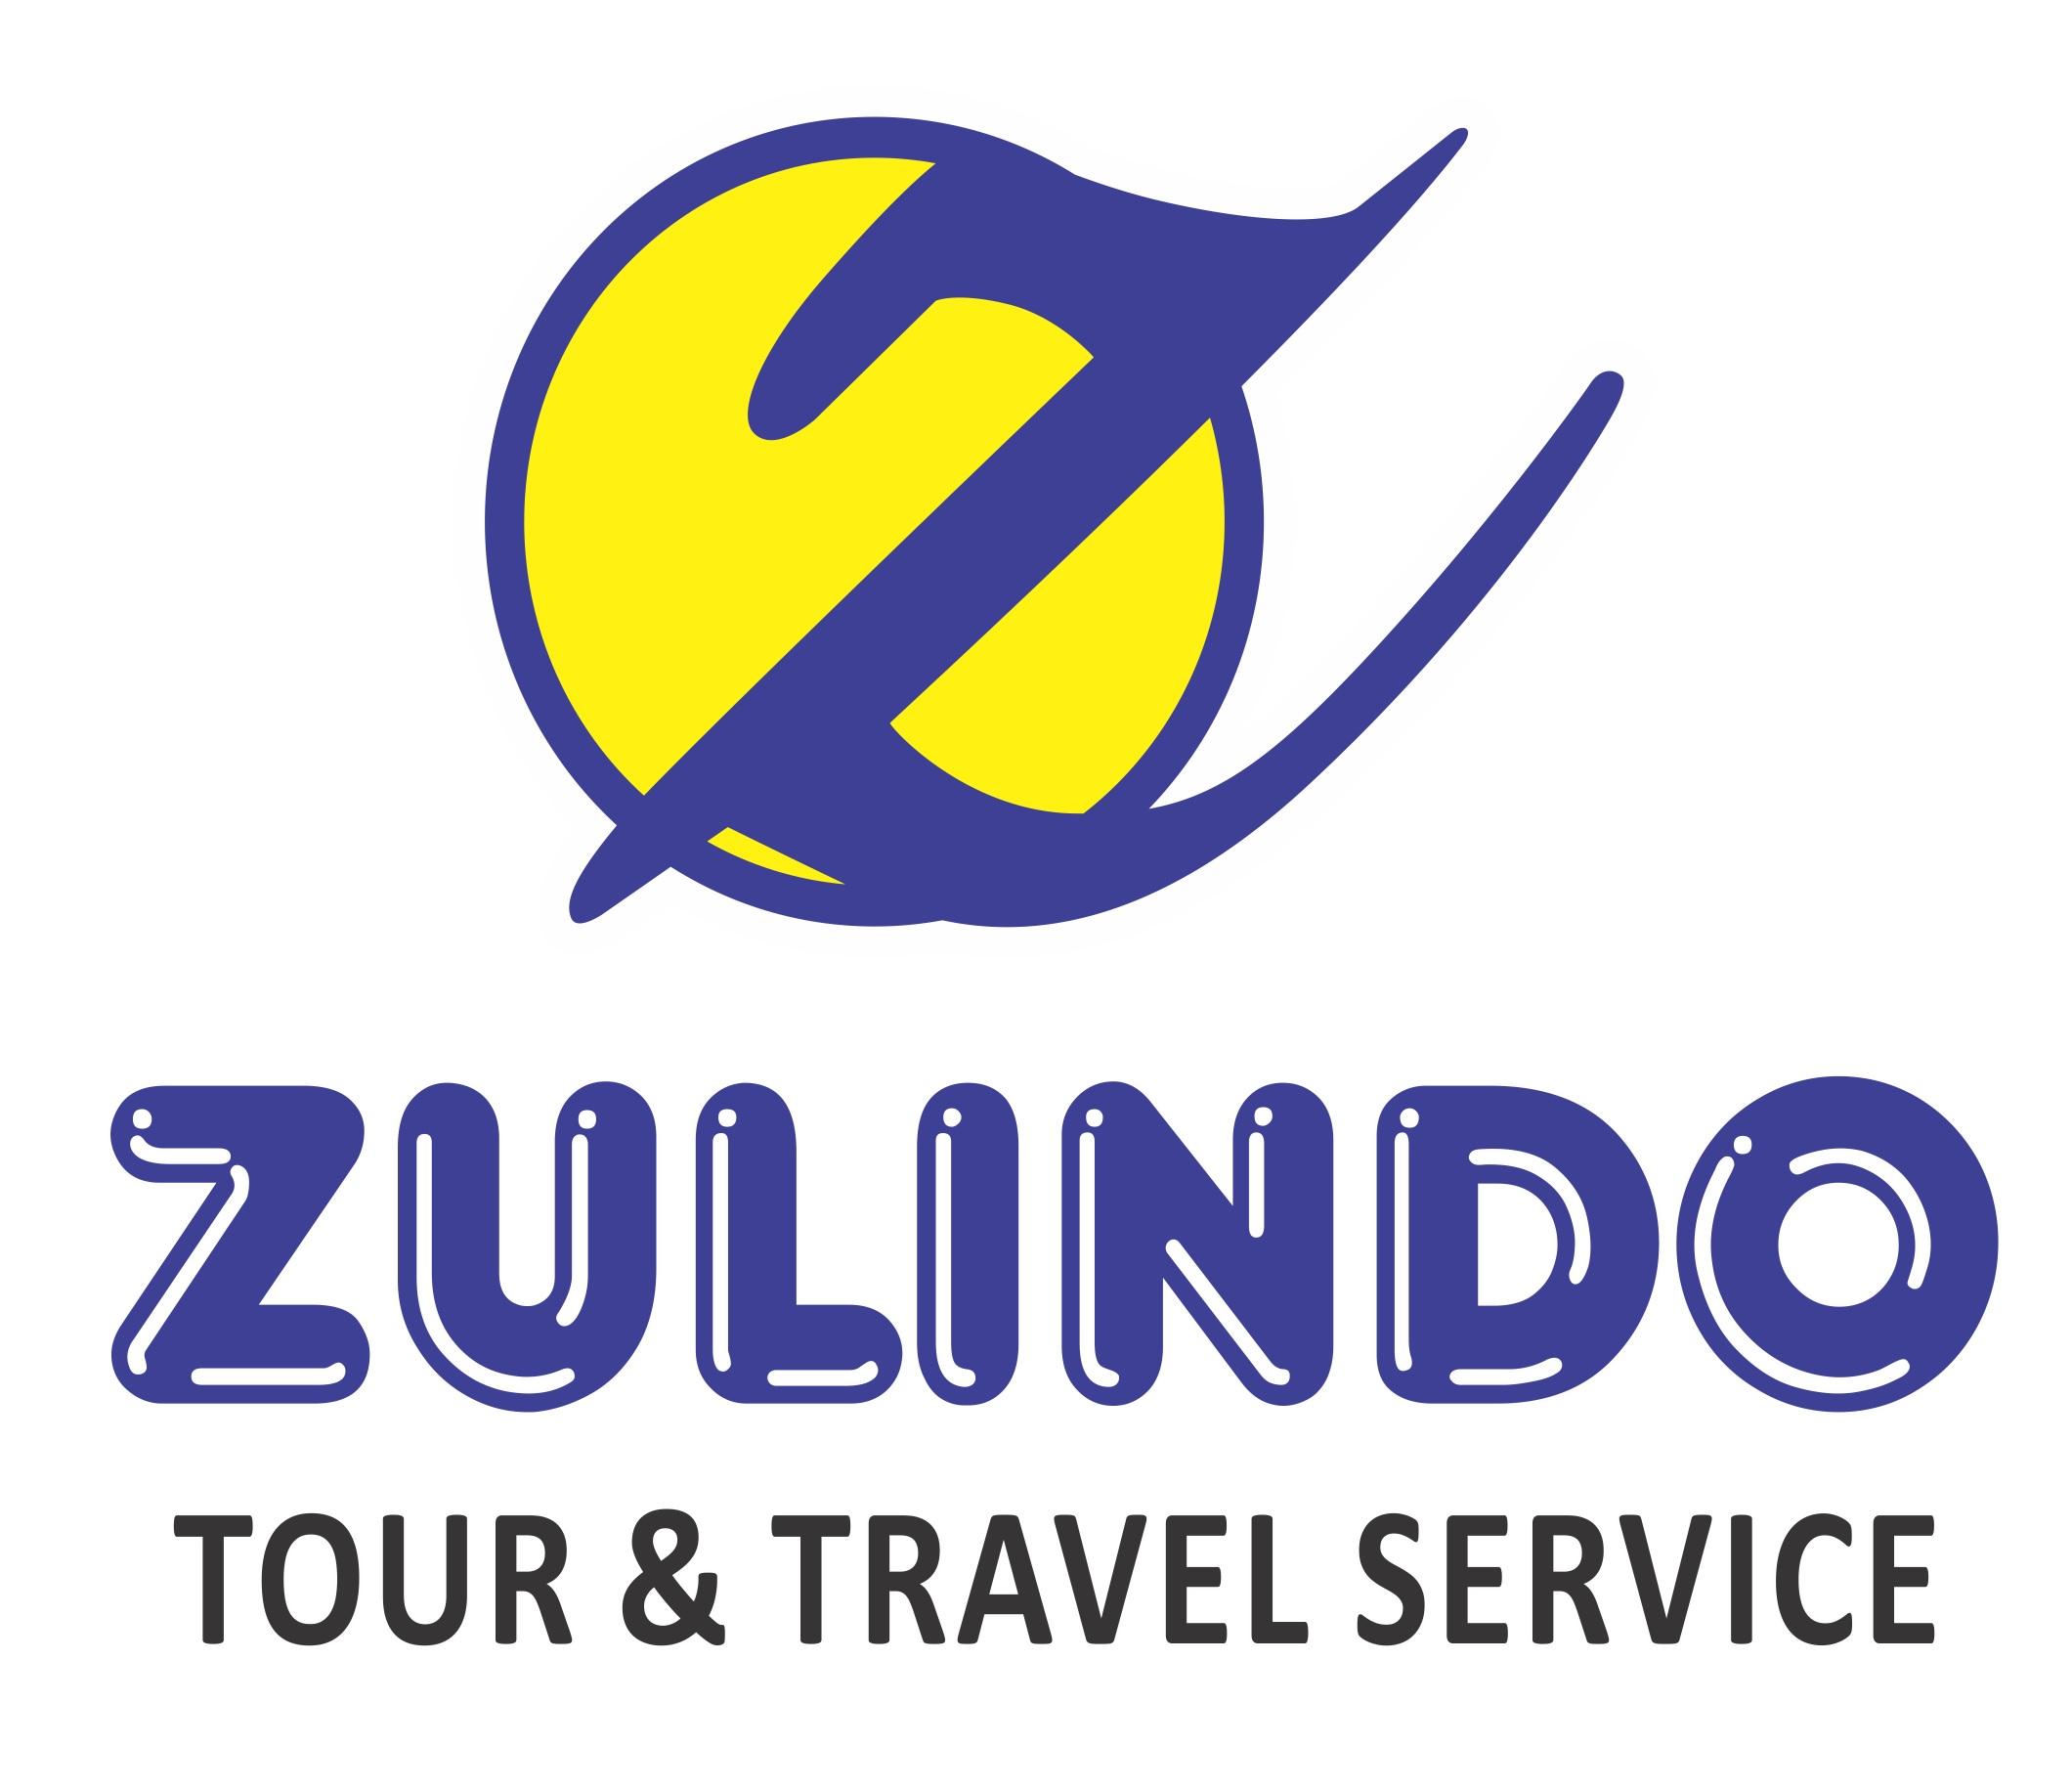 www.zulindo.com